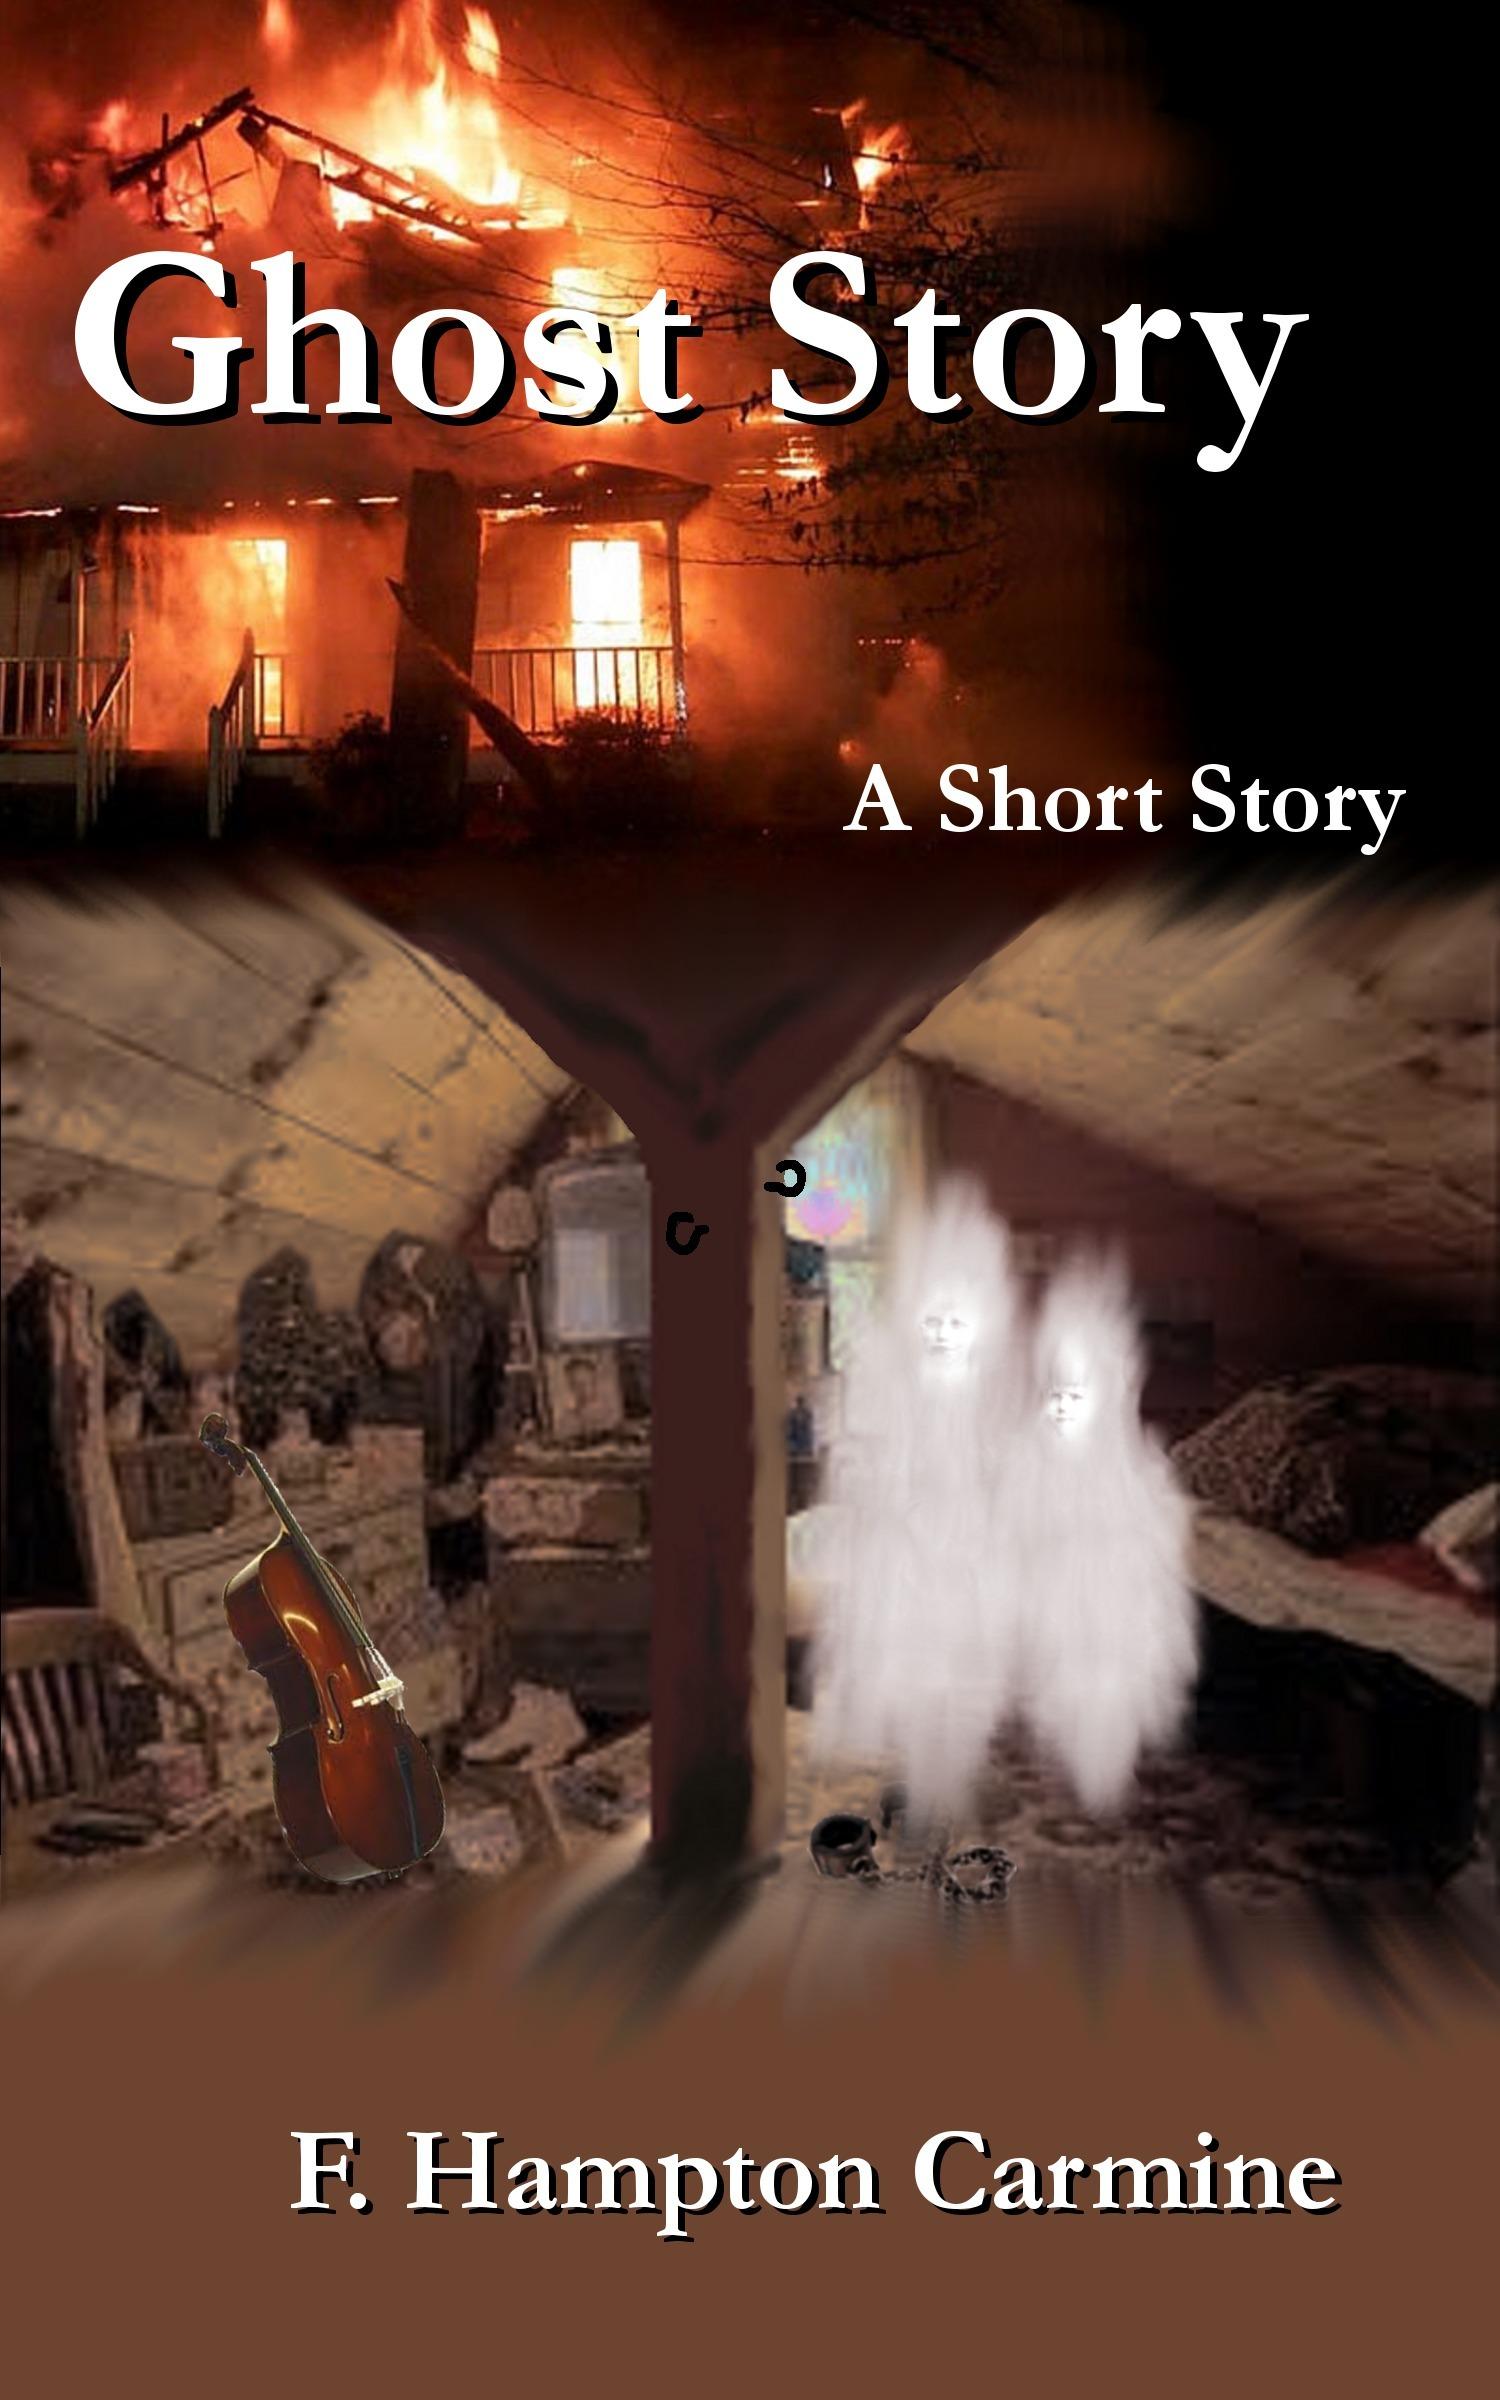 Ghost Story F. Hampton Carmine